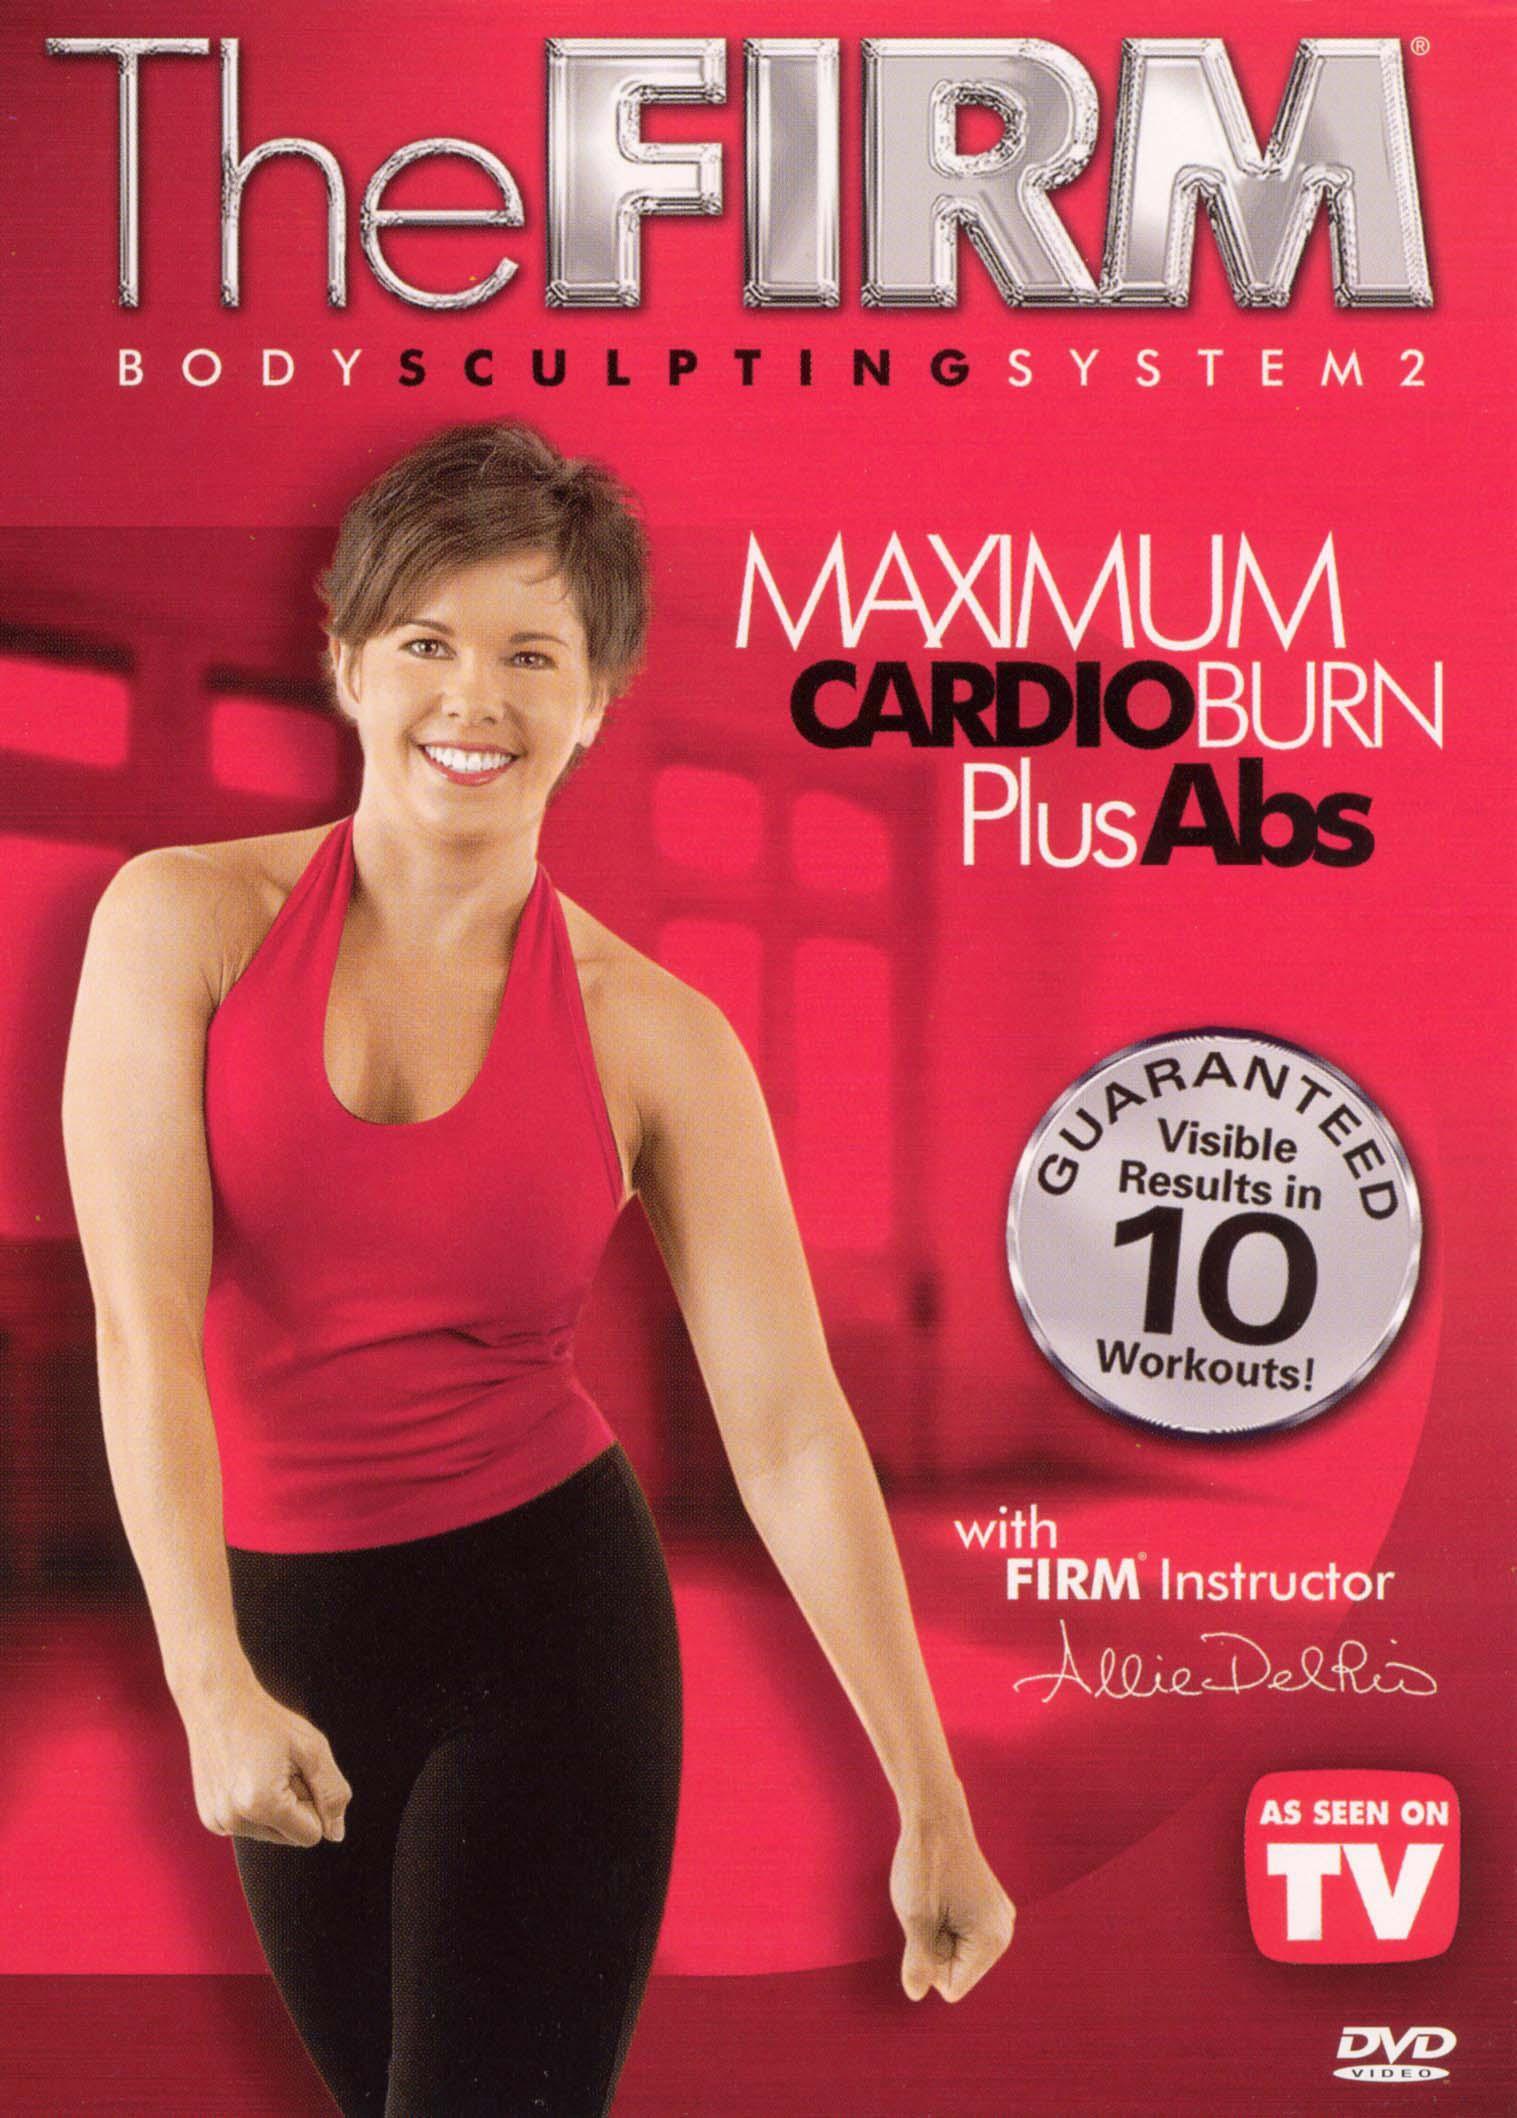 The Firm: Body Sculpting System 2 - Maximum Cardio Burn Plus Abs